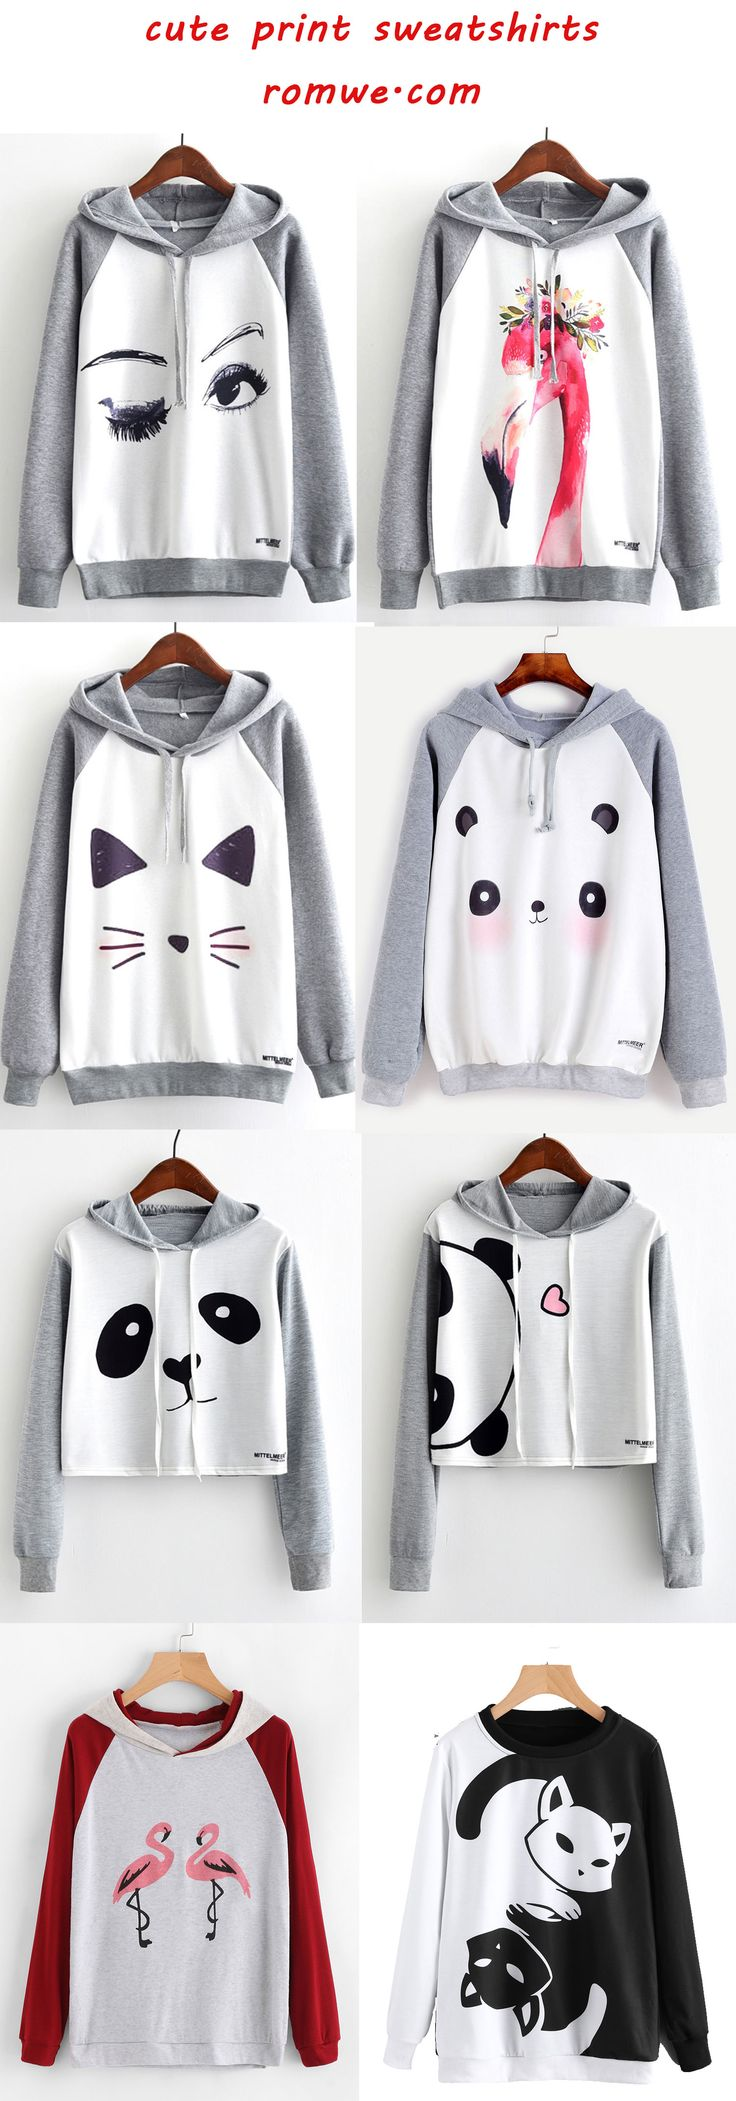 cute print sweatshirts 2017 - romwe.com